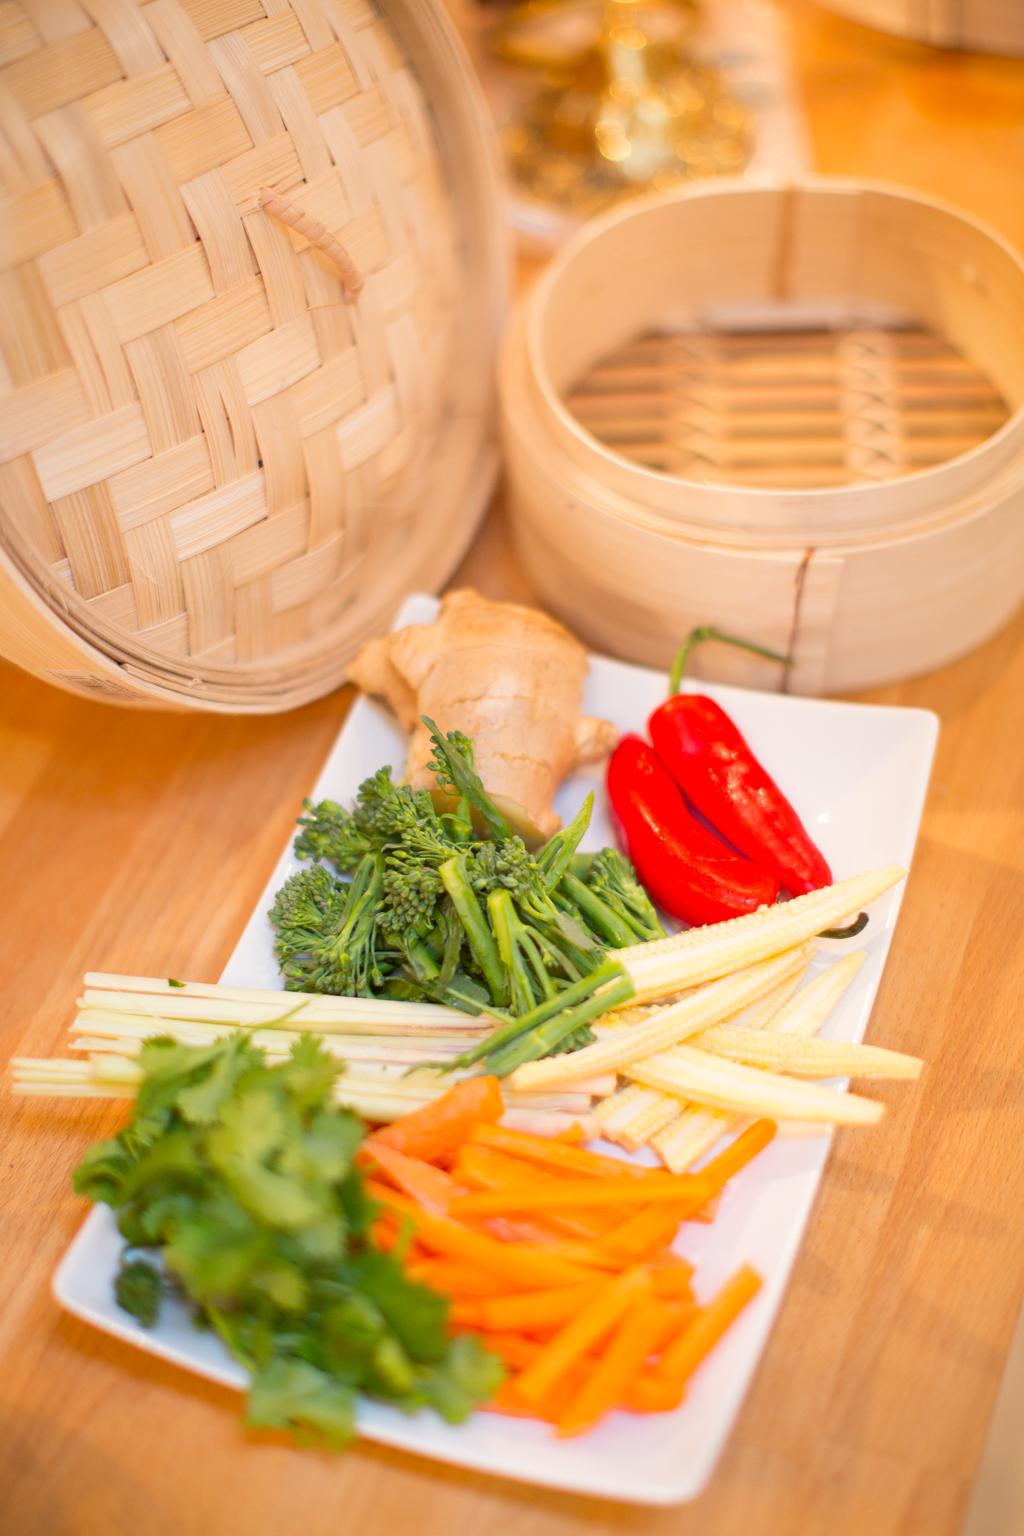 Fitness On Toast Faya Blog Girl Healthy Recipe Inspiratino Fish Steamed Seabass Ginger Carrot Wok Basket Bamboo Steam Diet Light-6